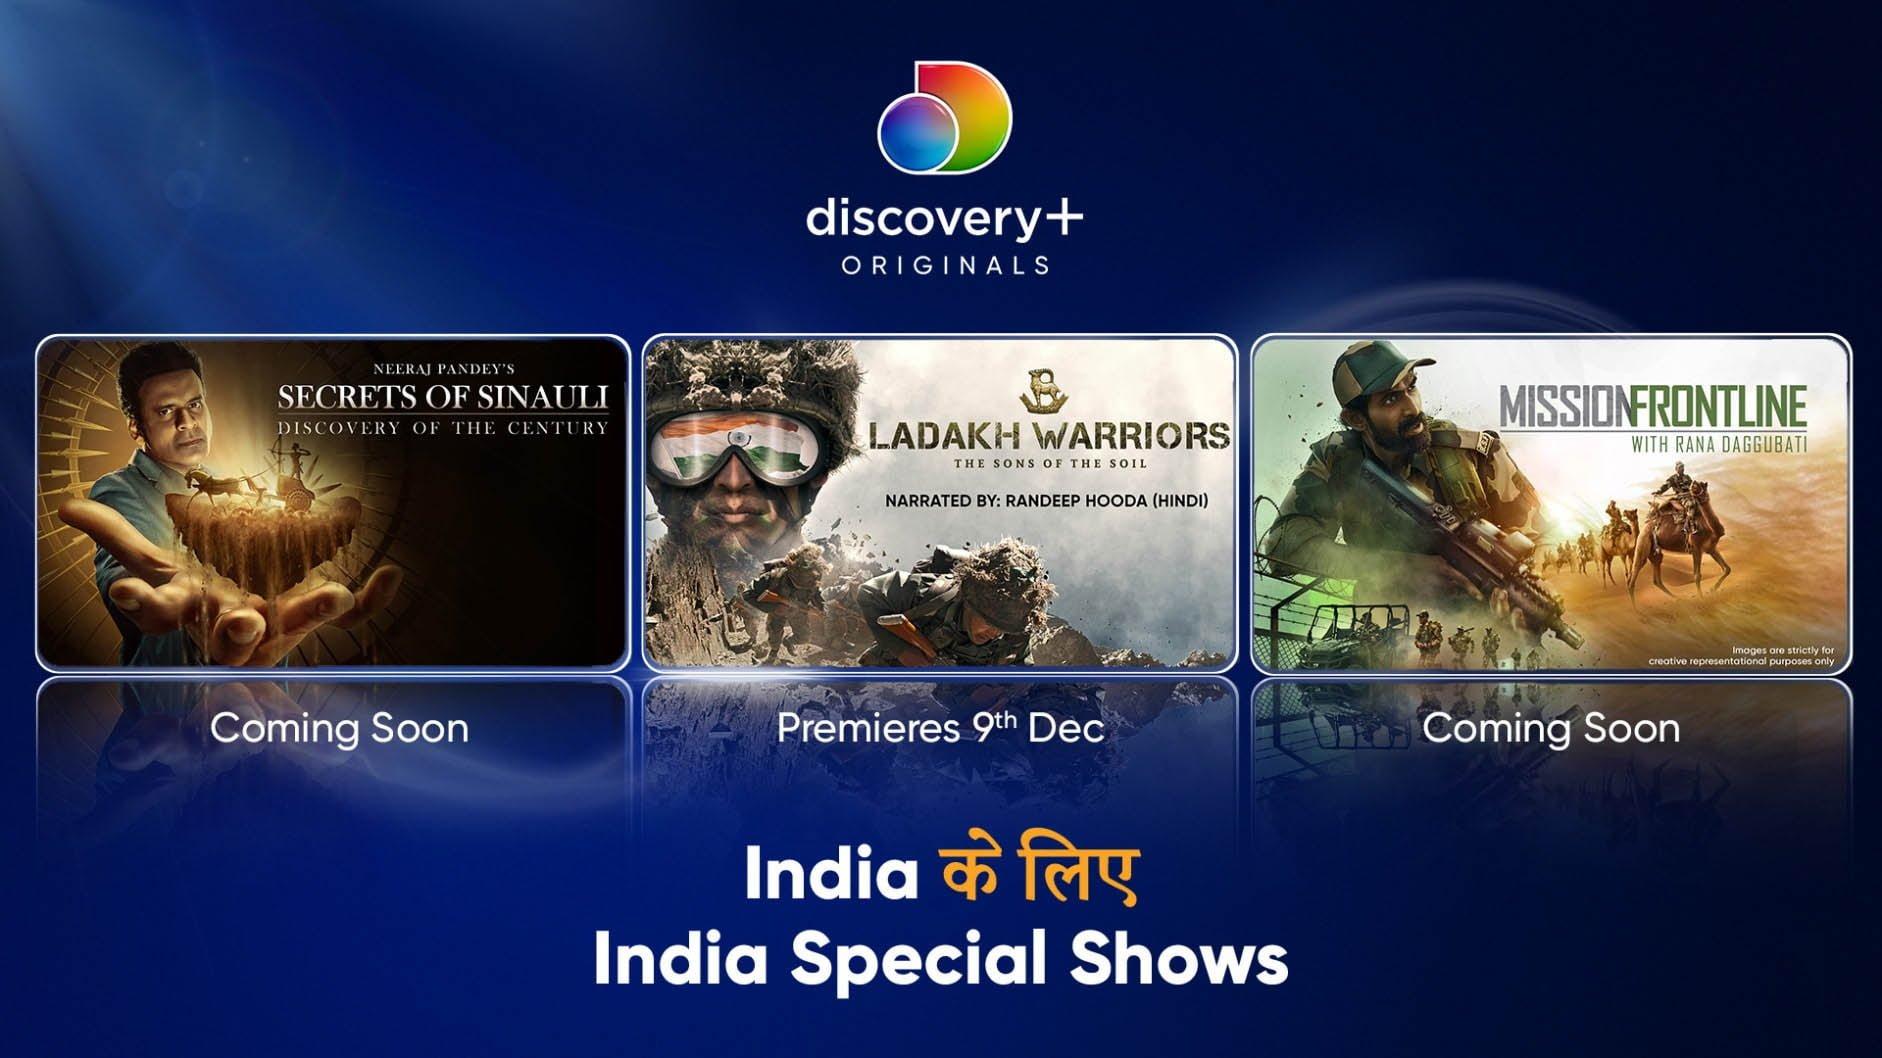 Discovery Originals India